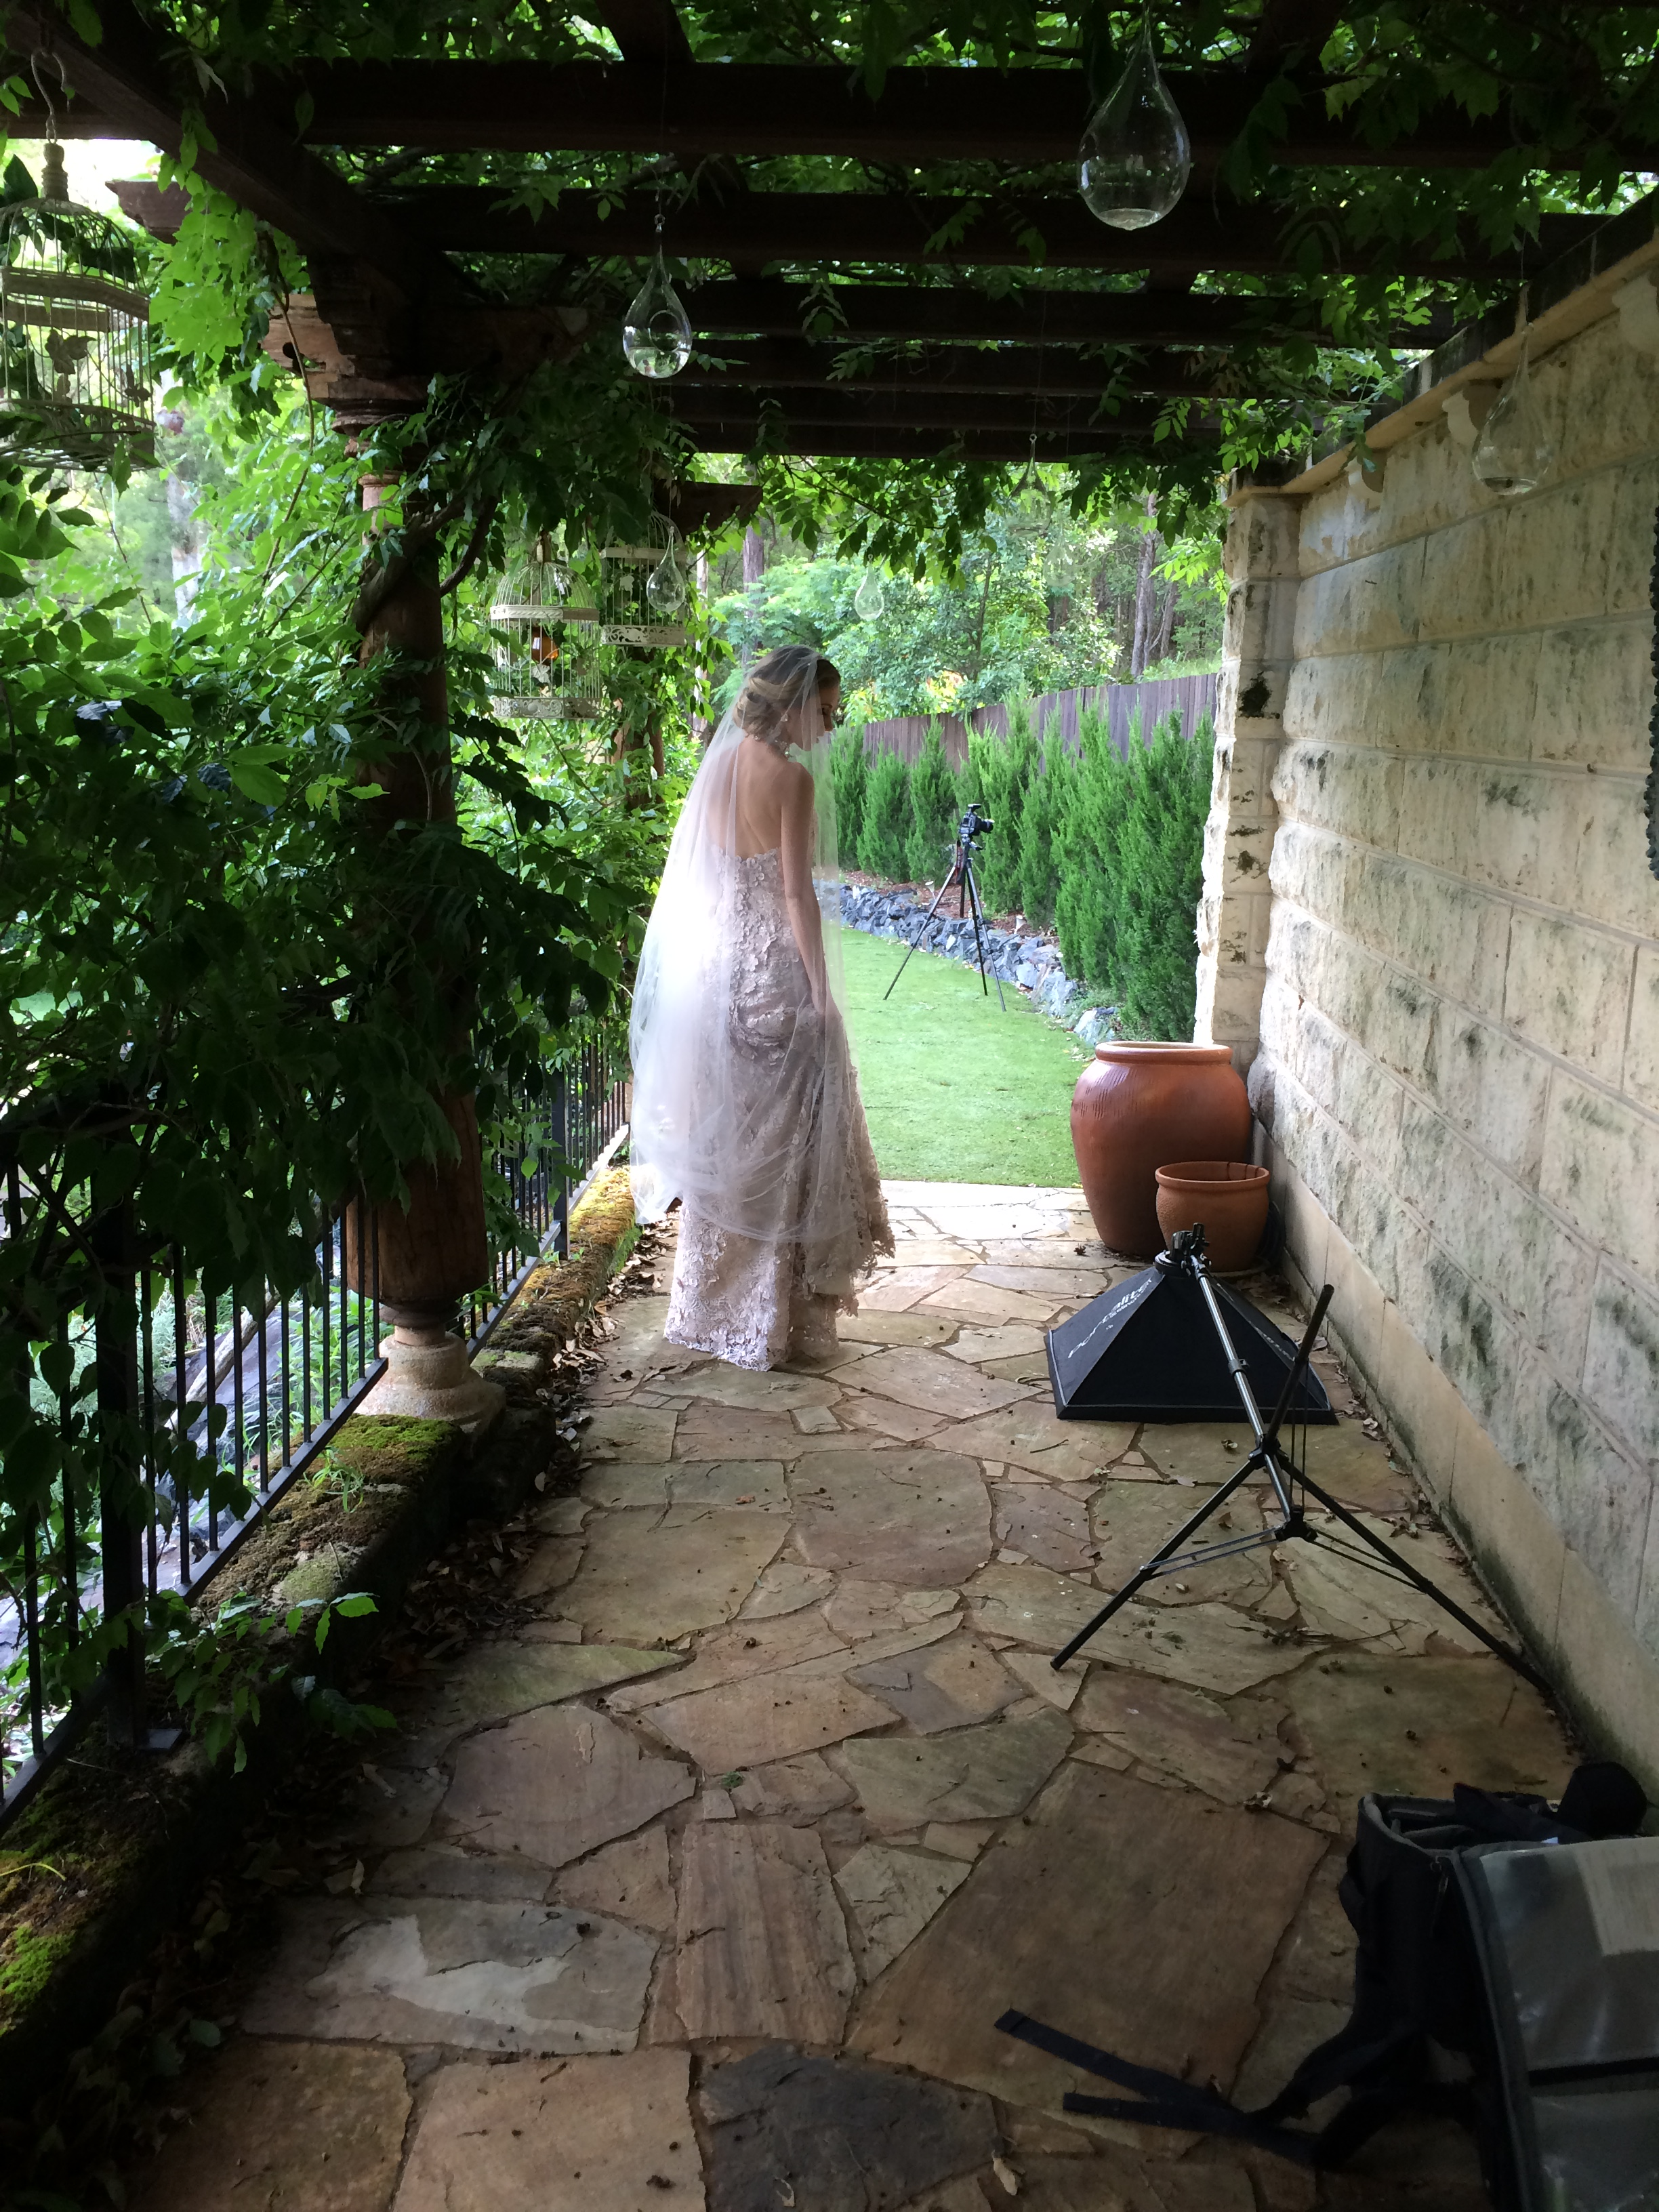 Helena Couture Designs - Multi Award Winning Australian Bridal Label